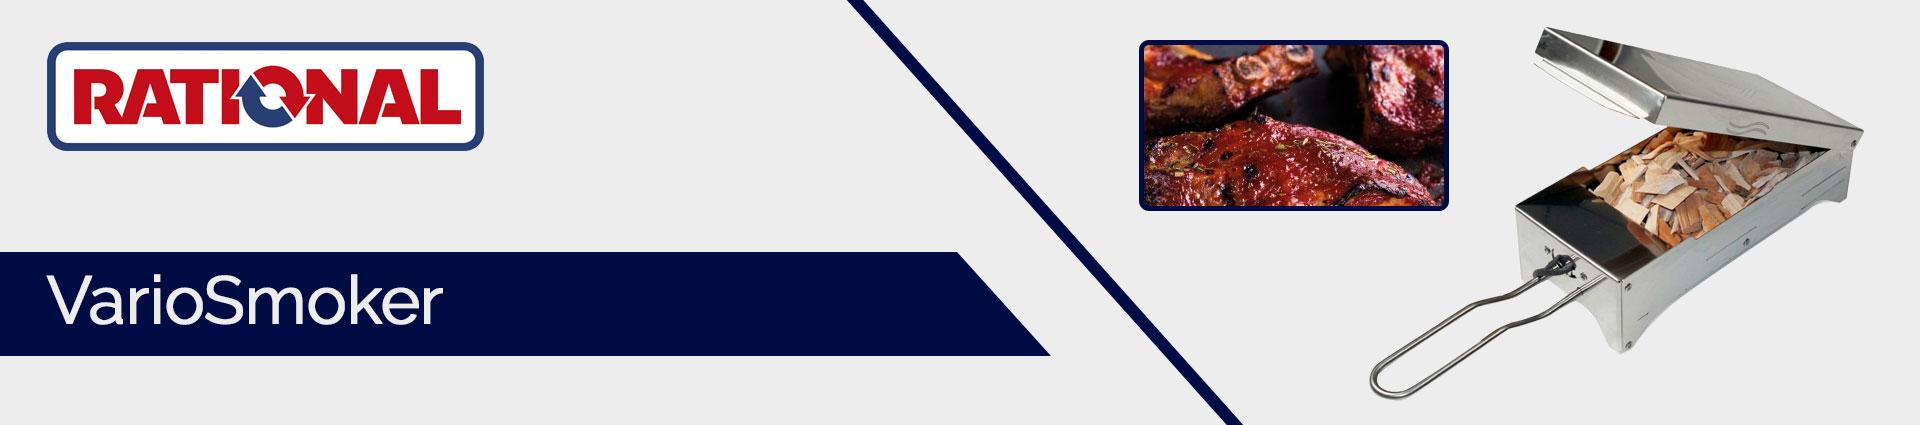 Rational VarioSmoker Banner